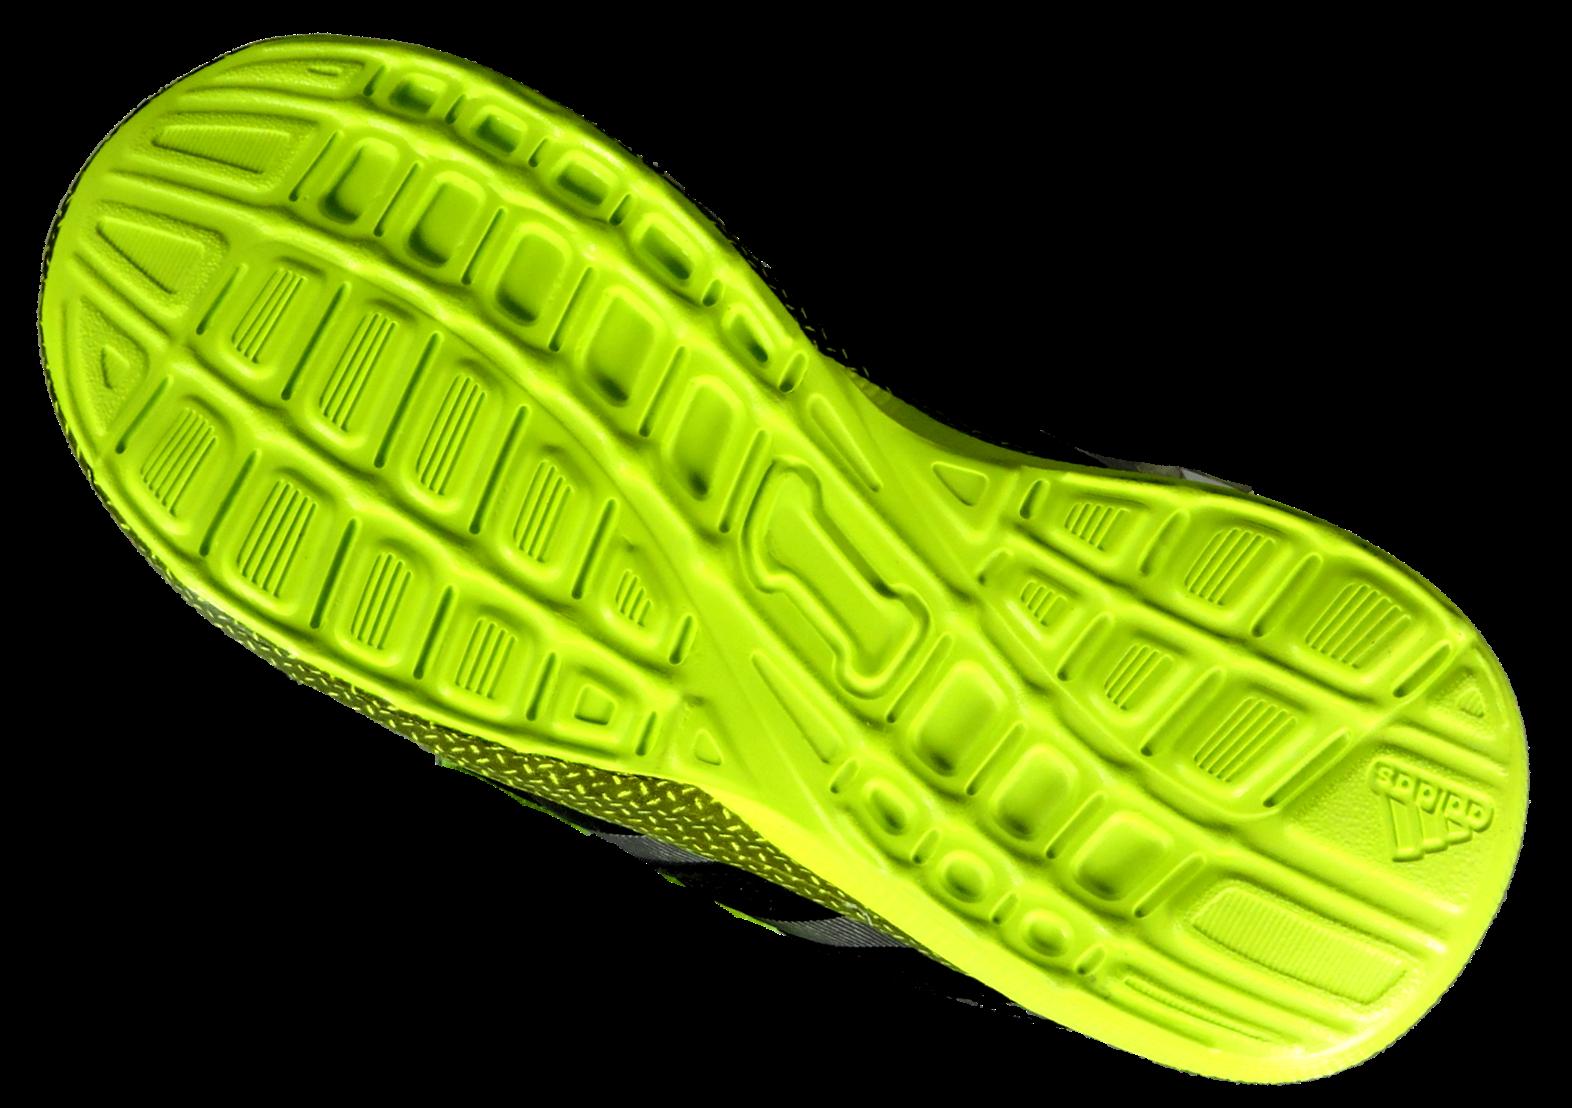 Adidas Hyperfast 2.0 Cfi